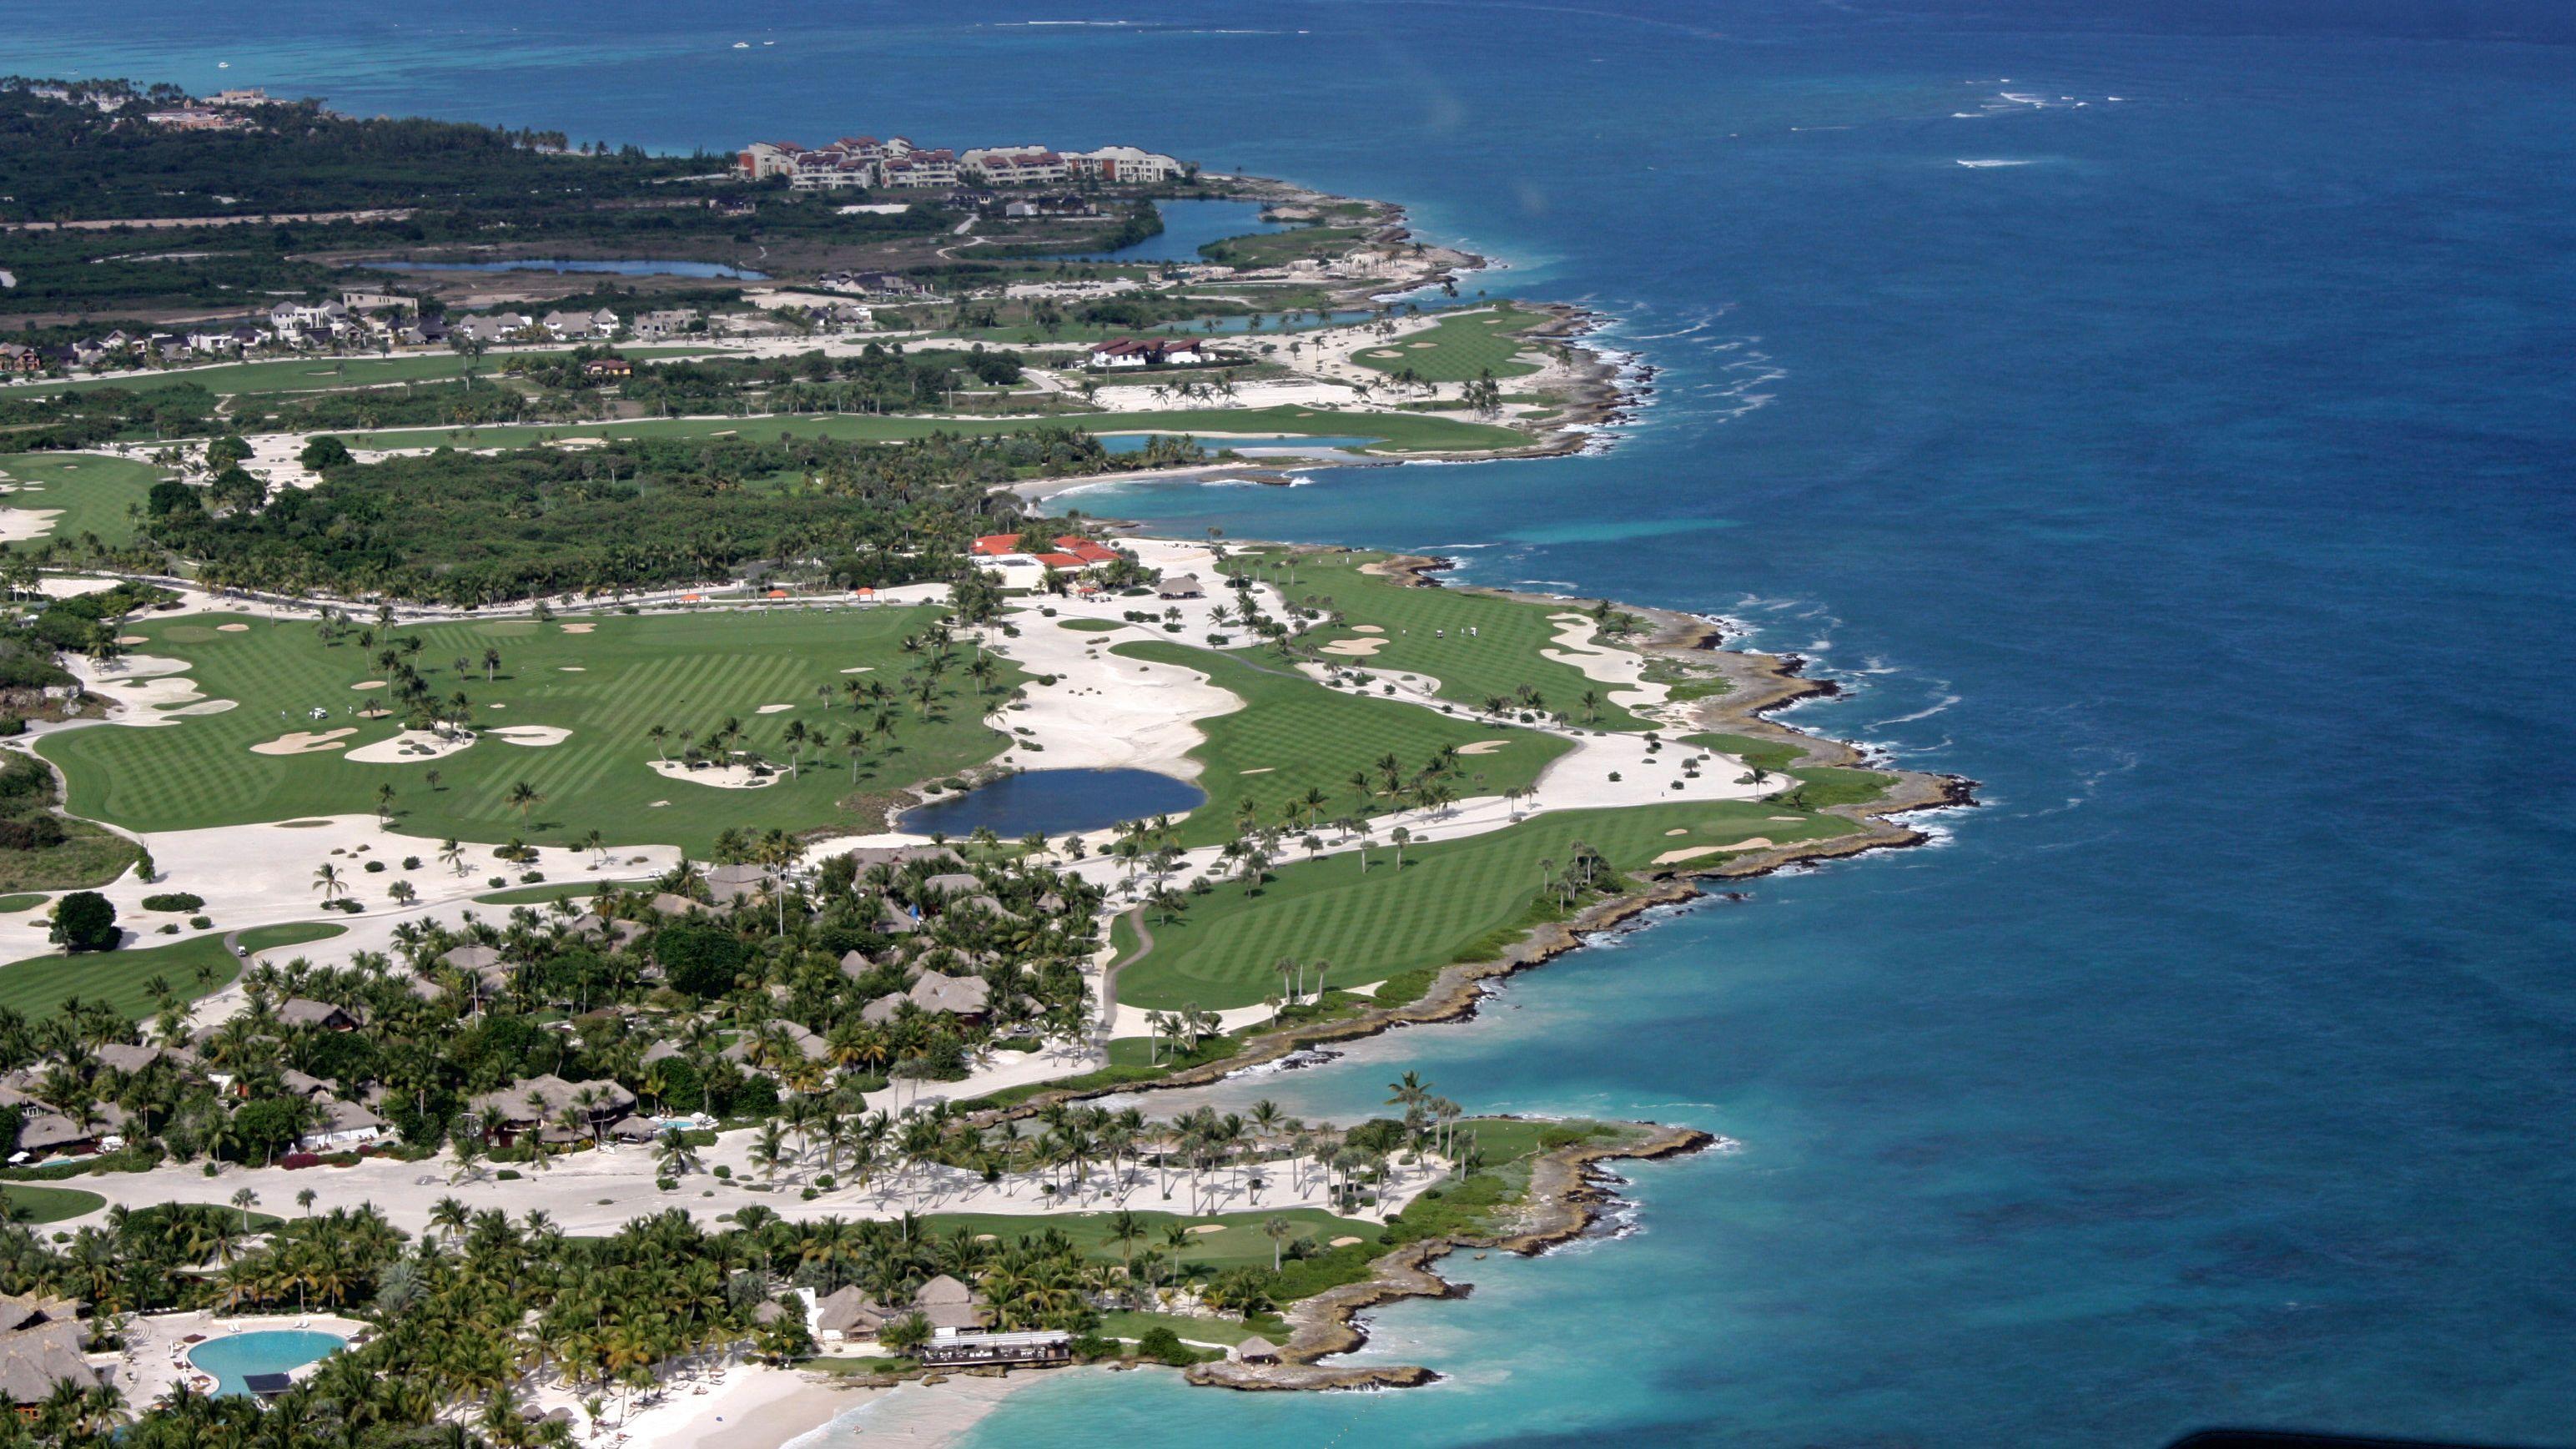 Coastline view in Punta Cana